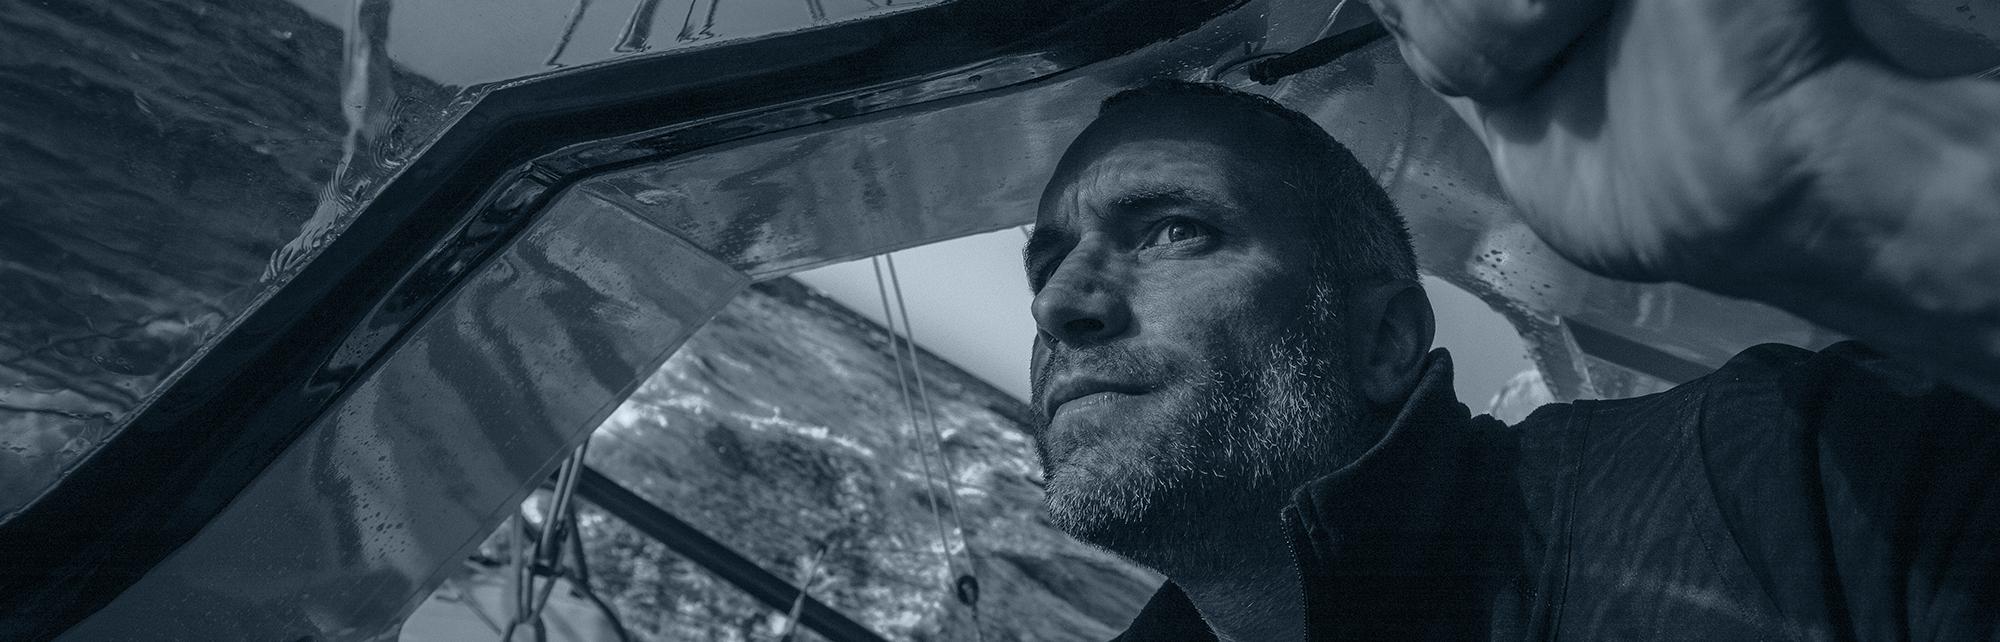 Fabrice Amedeo - Un marin engagé